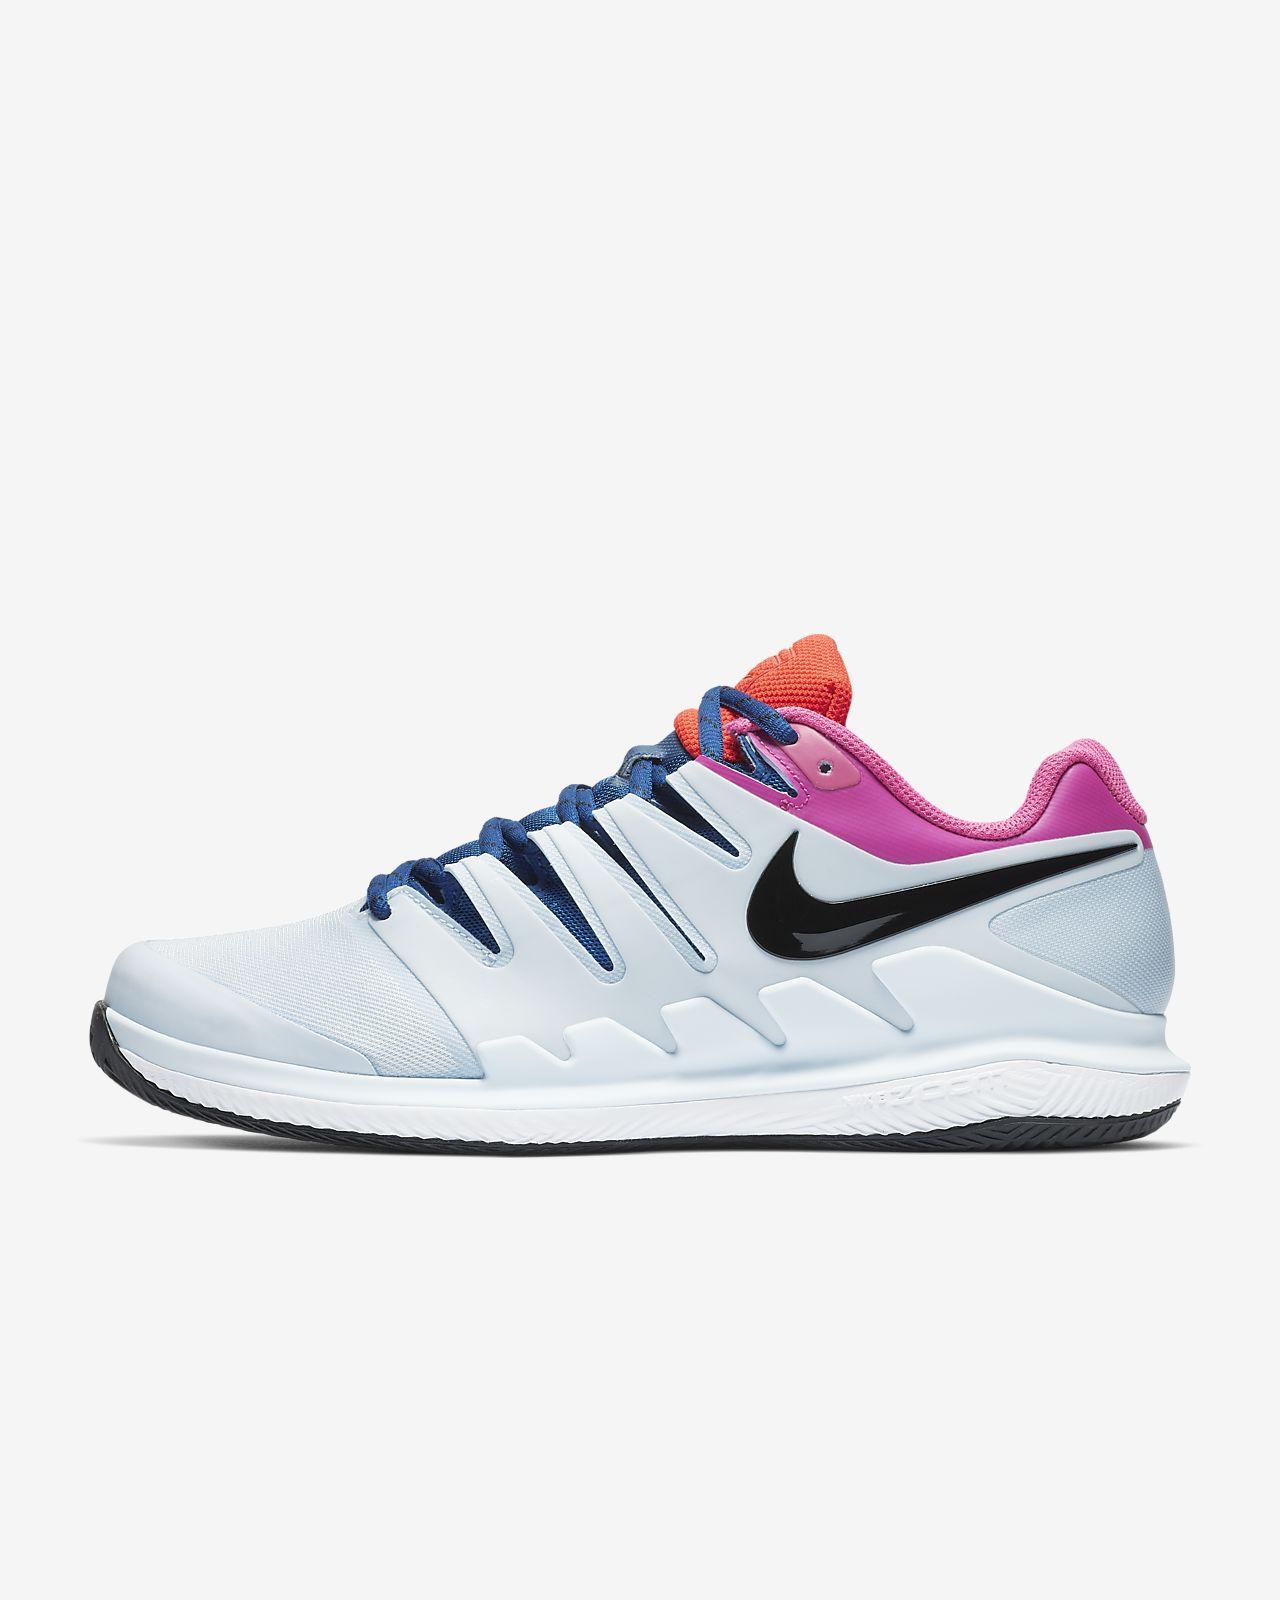 brand new 40a71 2fb5e ... Chaussure de tennis Nike Air Zoom Vapor X Clay pour Homme